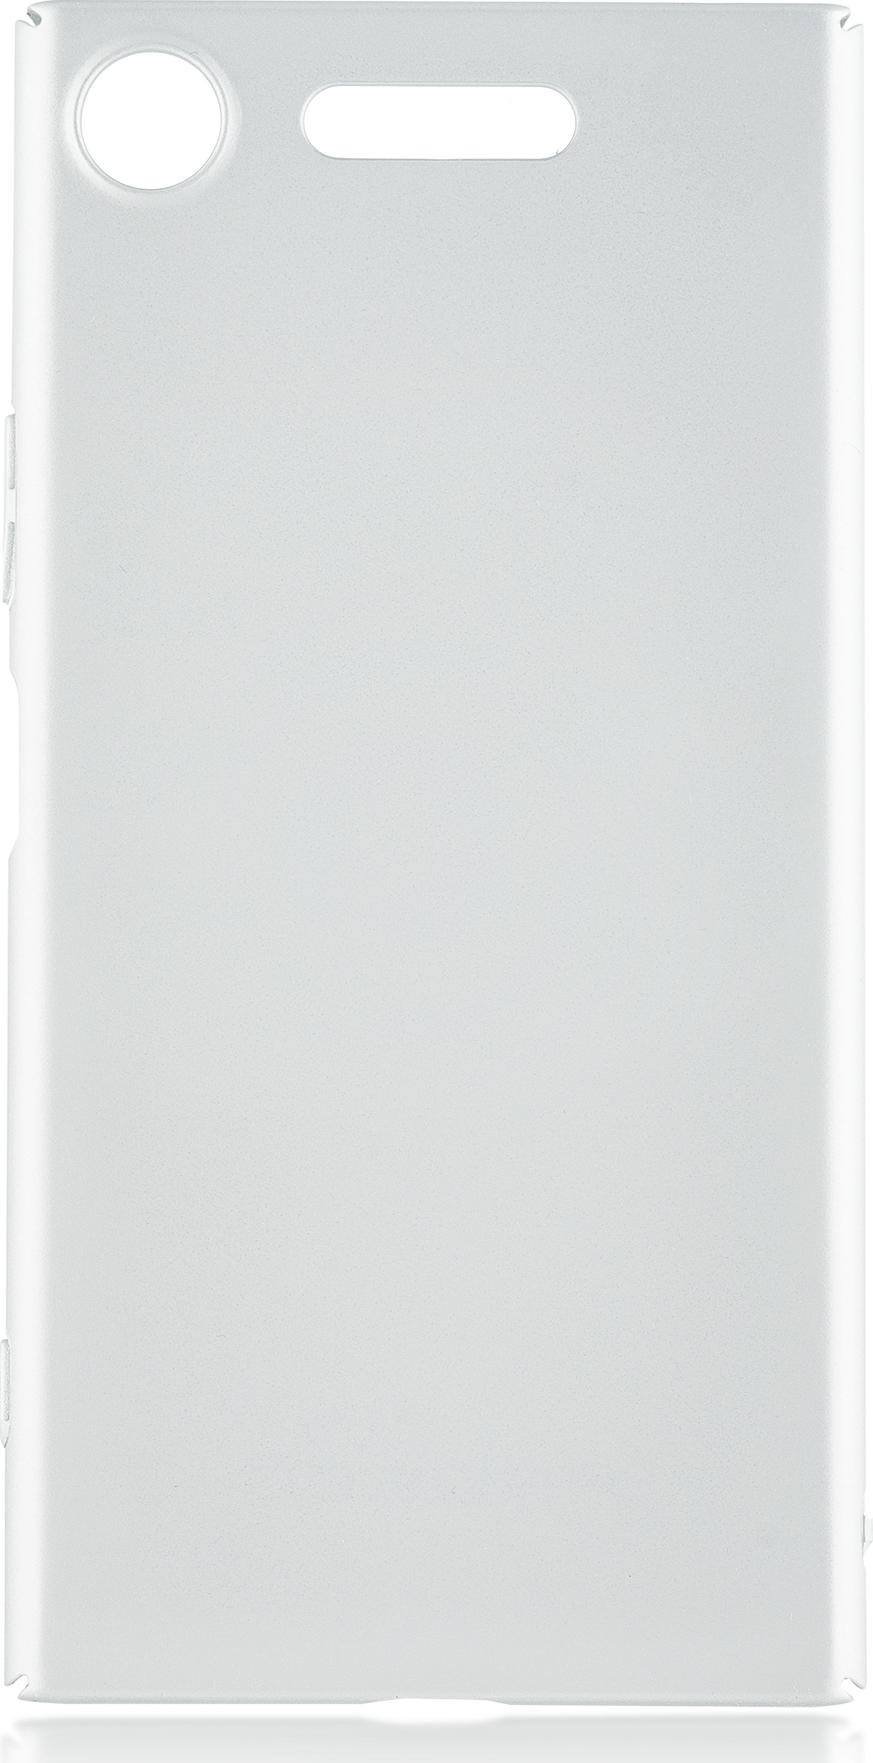 Чехол Brosco 4Side Soft-Touch для Sony Xperia XZ1, серебристый